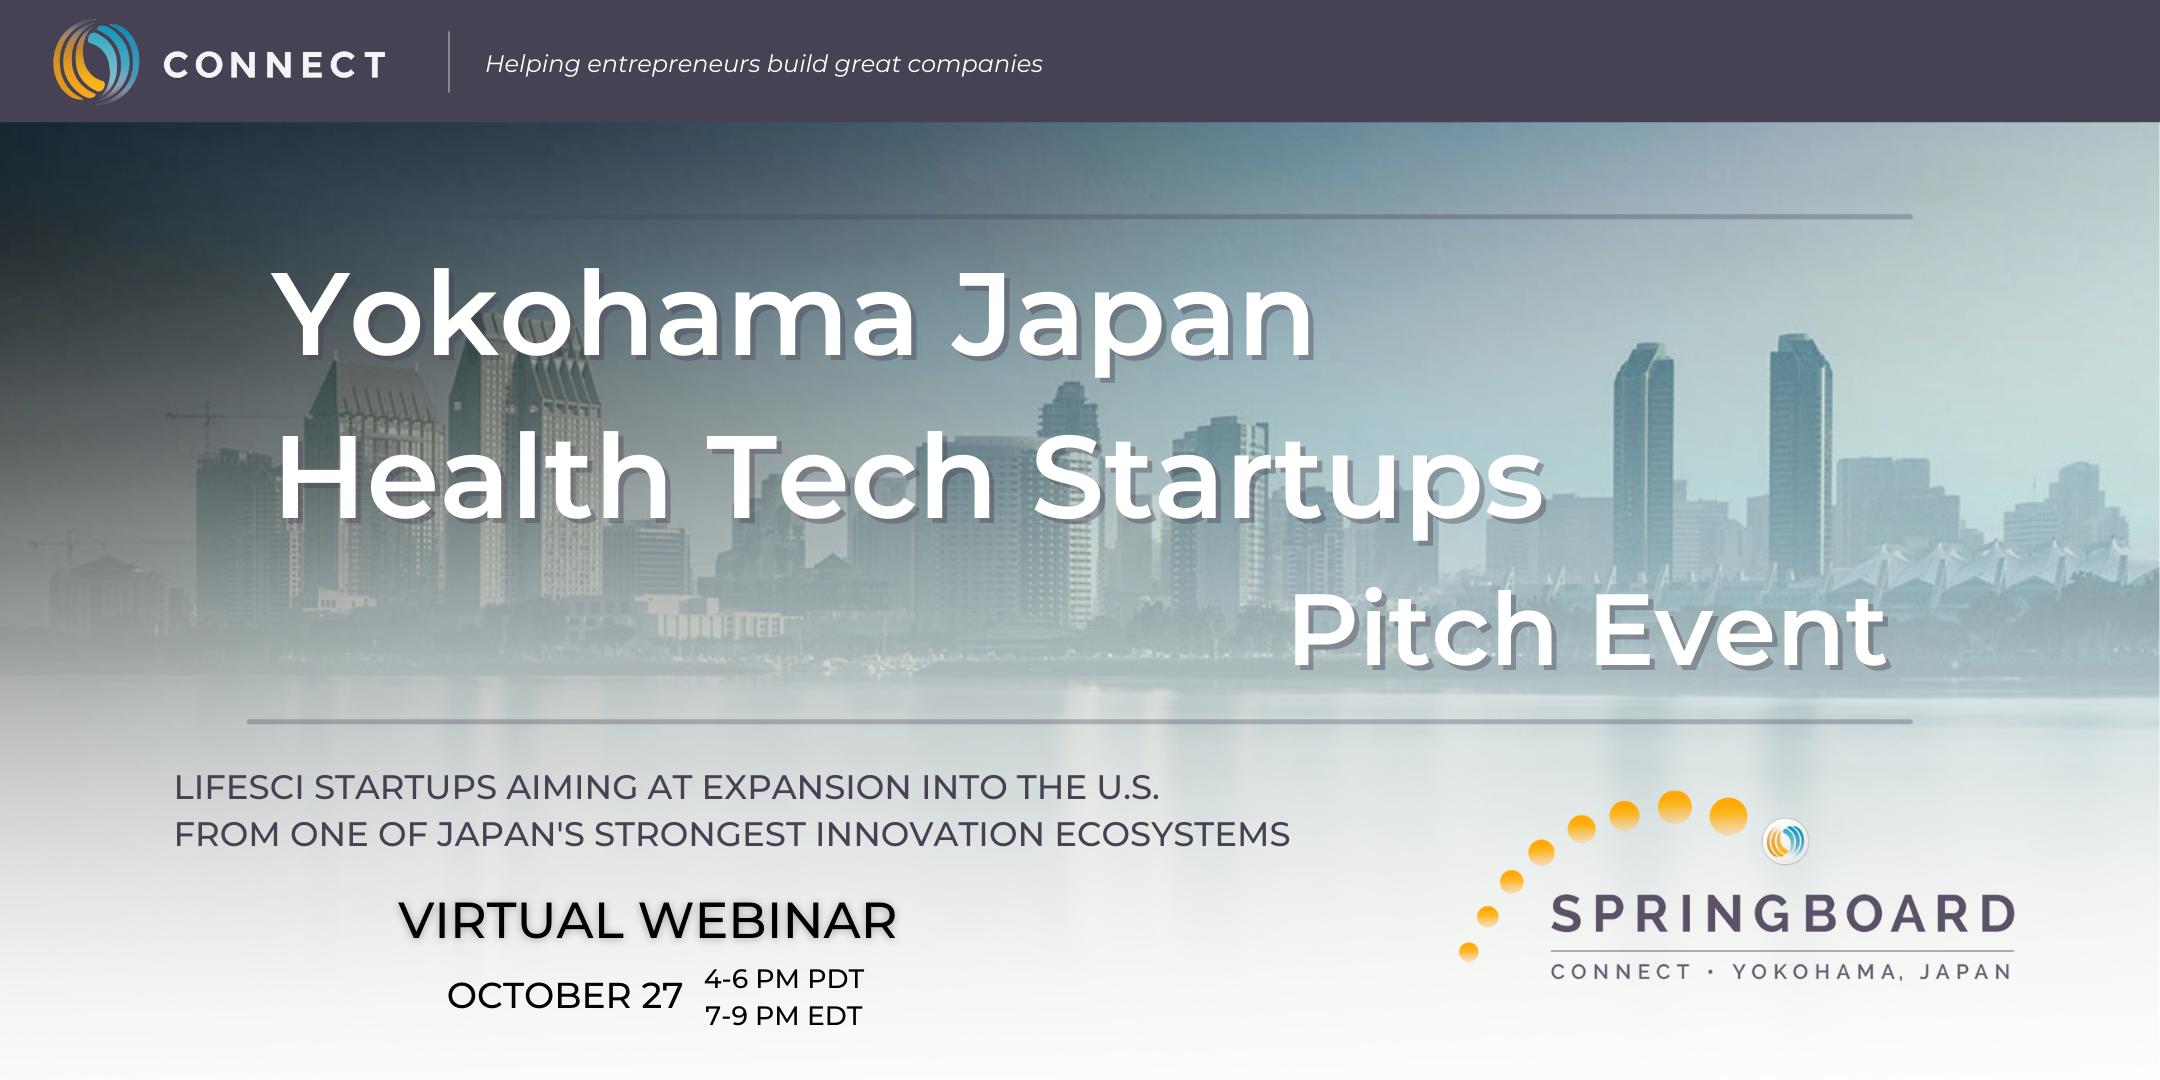 Connect San Diego Innovation Business Lifesci Medtech Biotech Startups Funding Capital Springboard Yokohama Banner 01 2